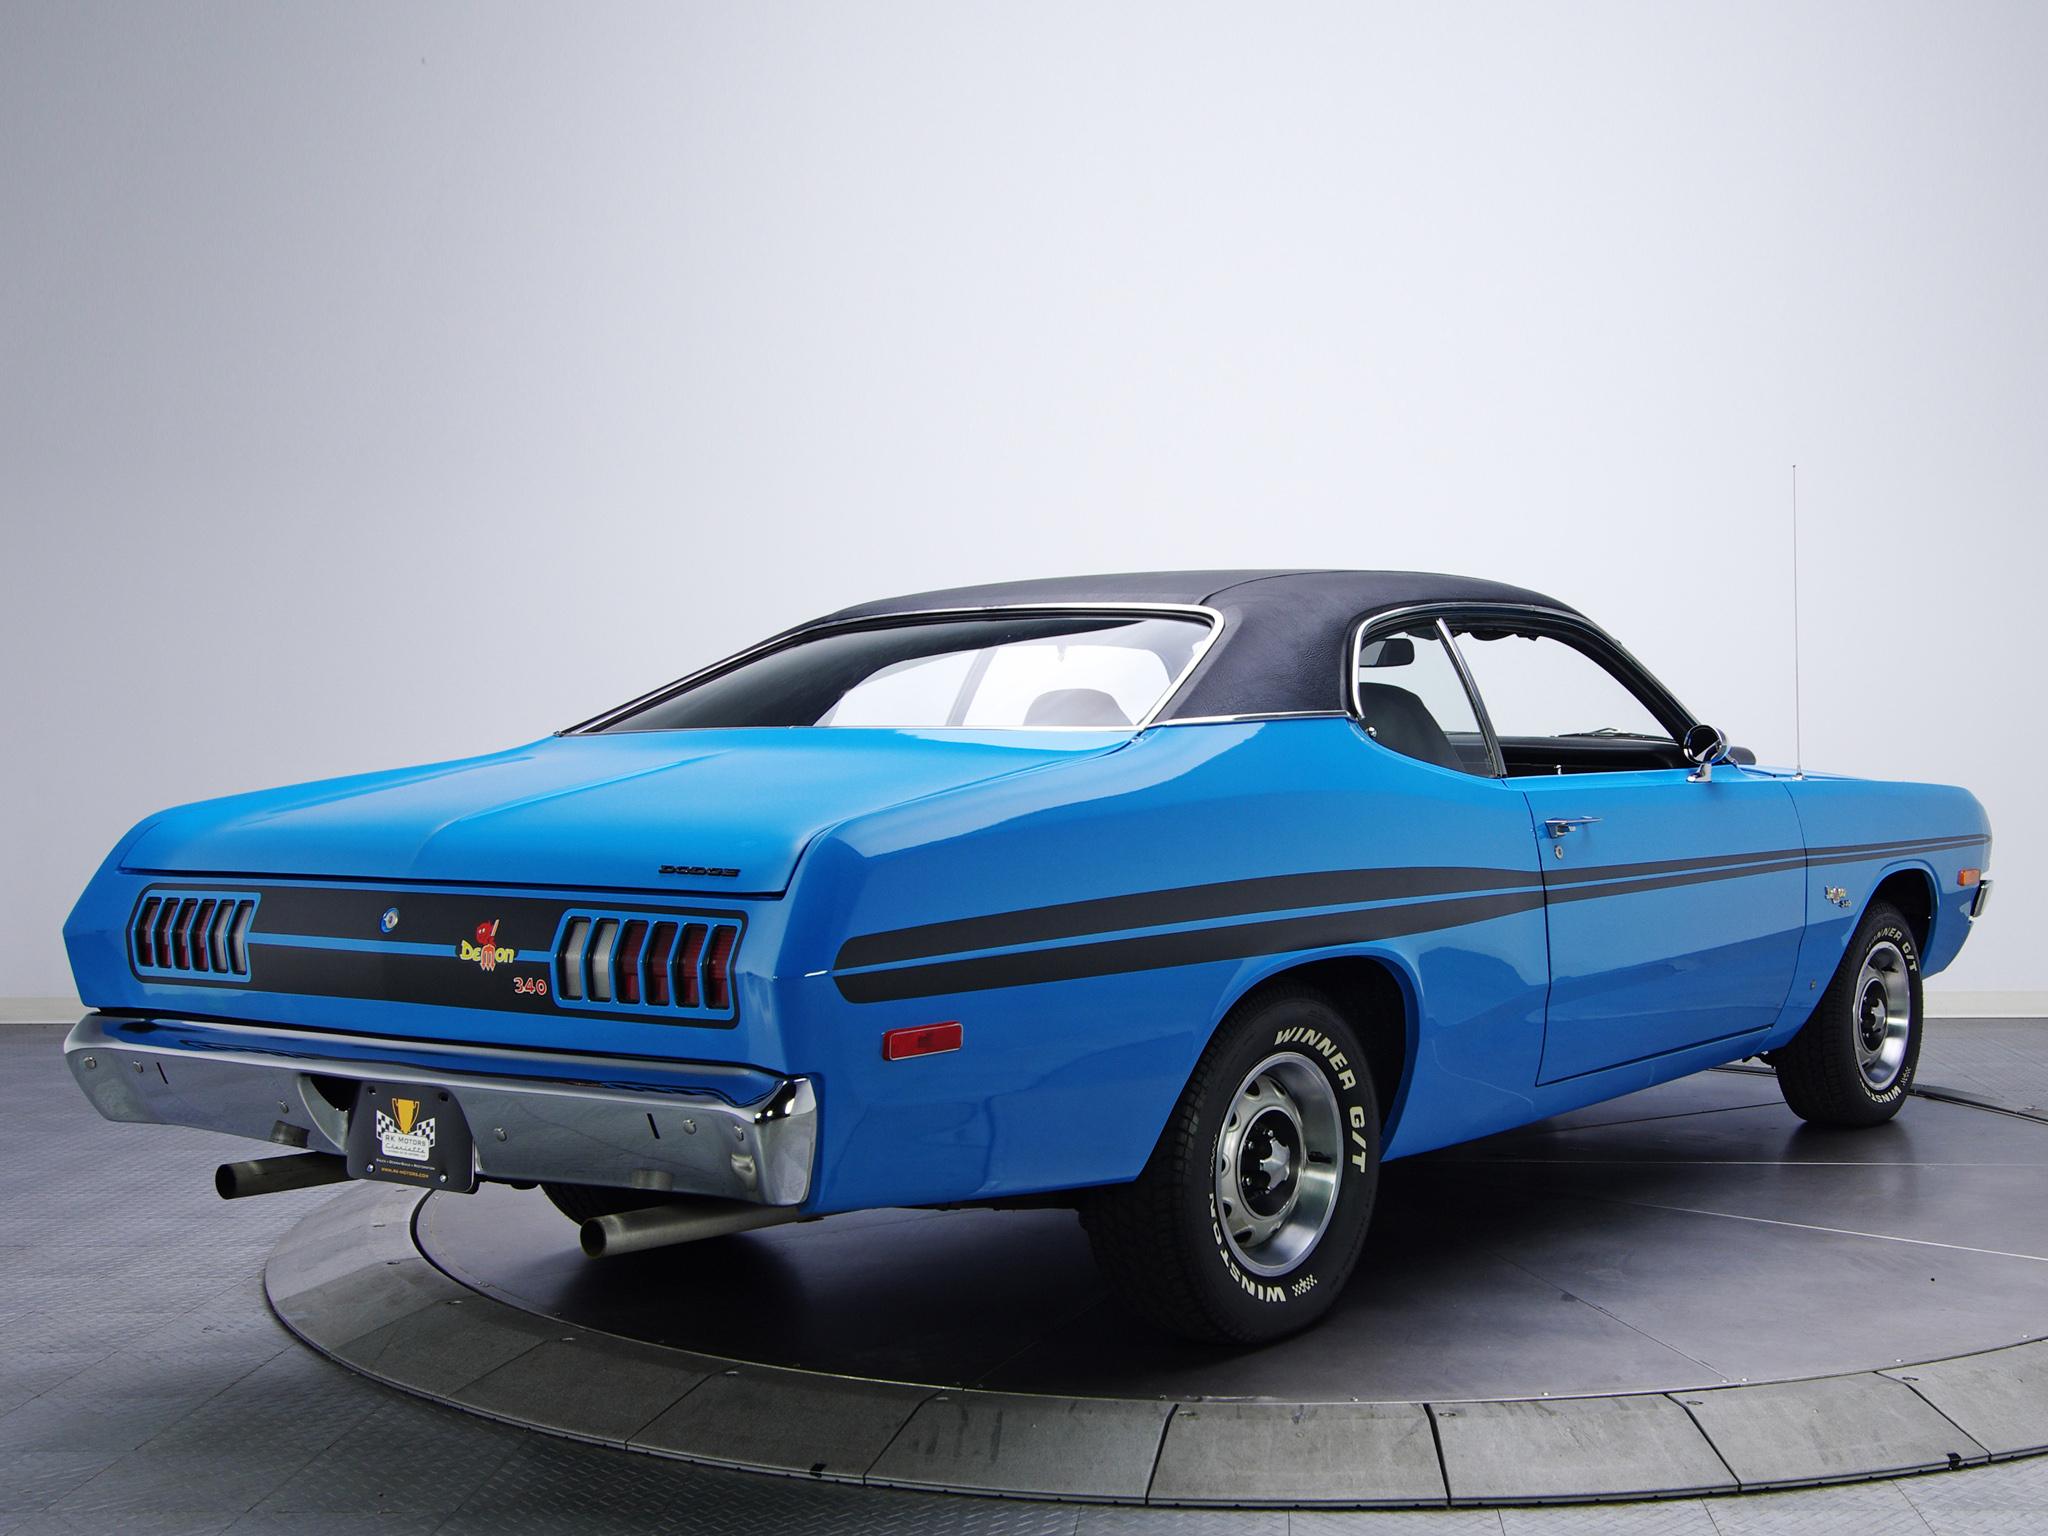 1972 Dodge Dart Demon 340 LM29 muscle classic g wallpaper 2048x1536 2048x1536